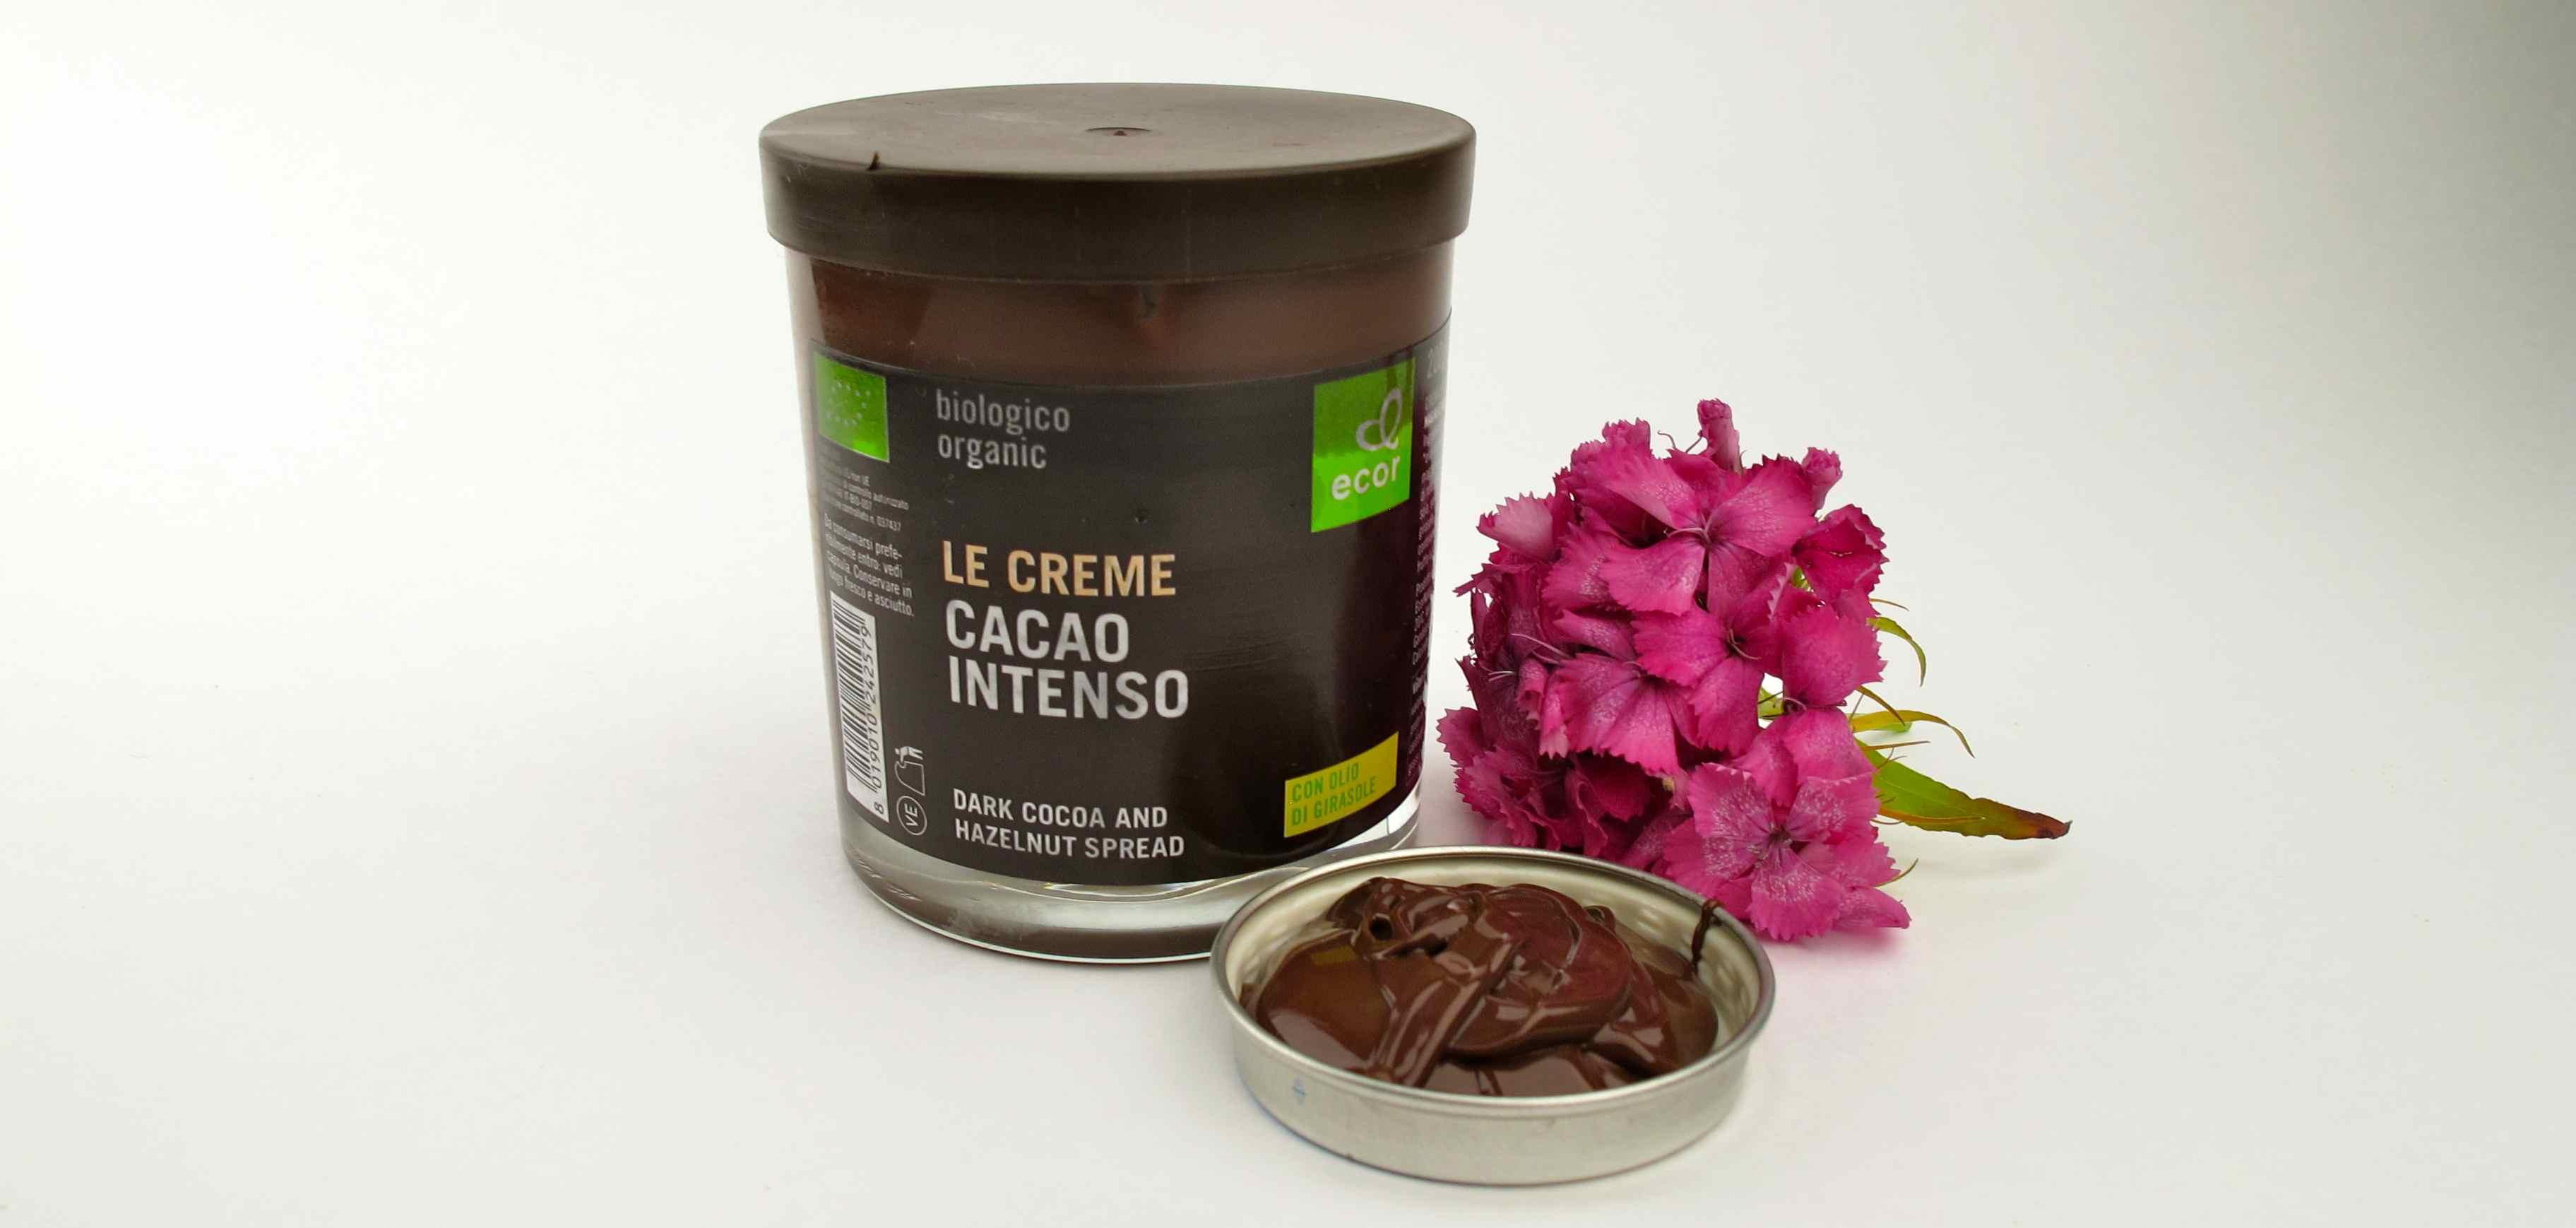 Chocolate paste vegan organic inside